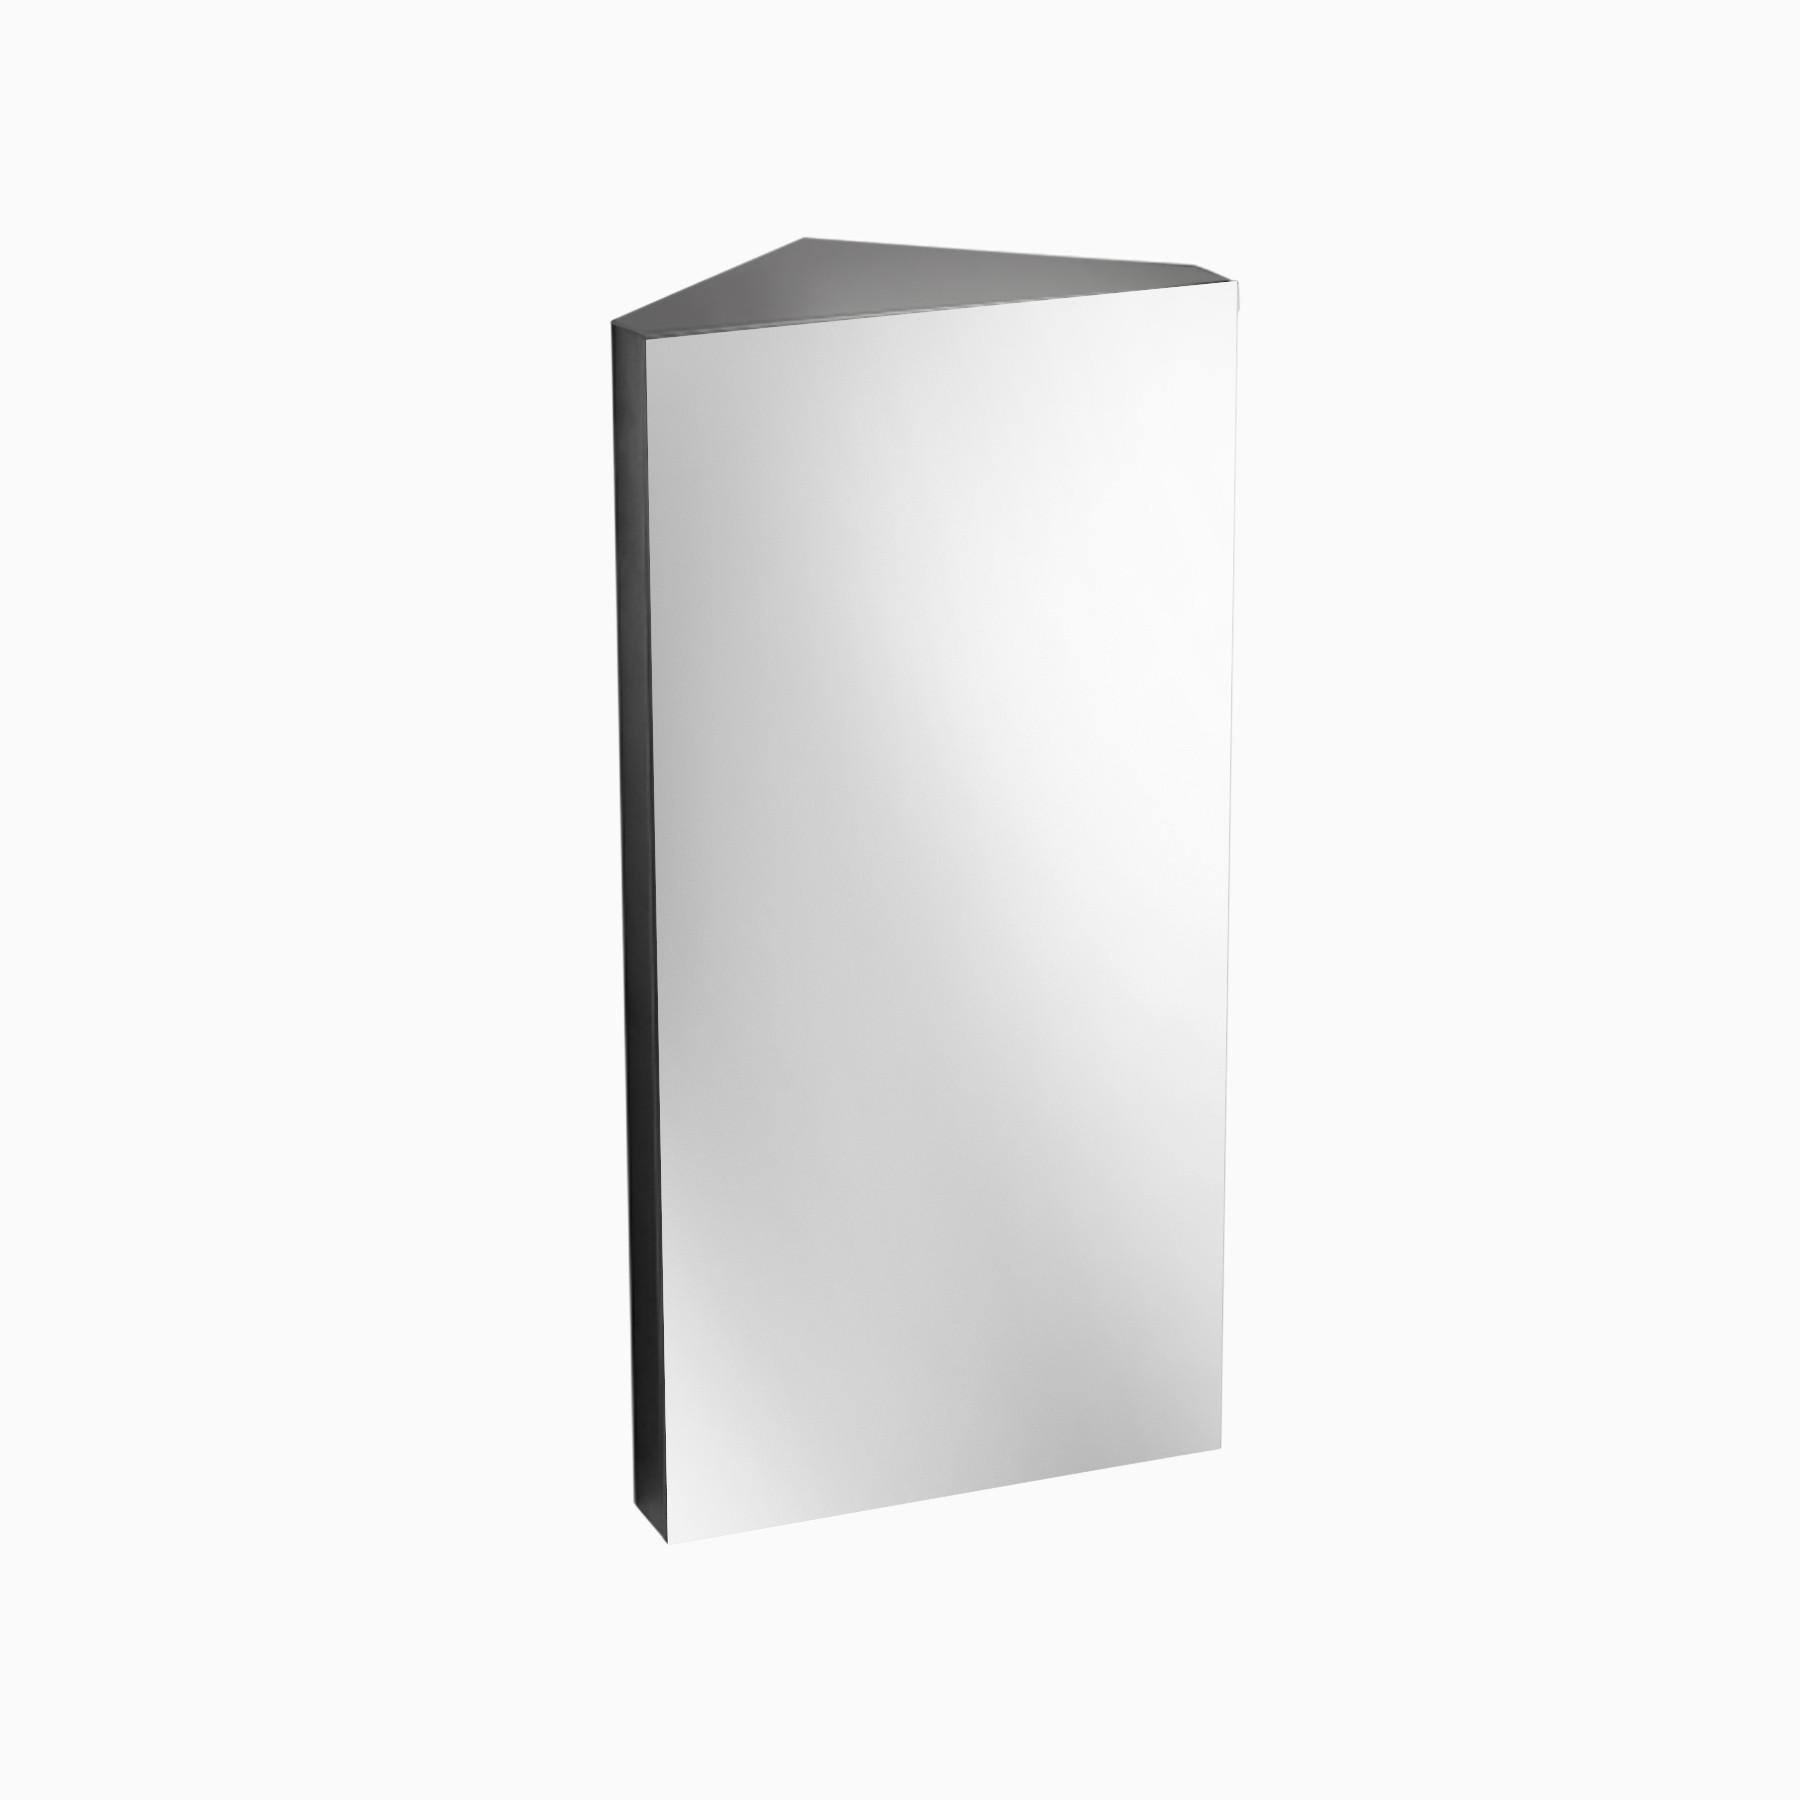 24 Inch Del Rey Rectangular Corner Medicine Cabinet